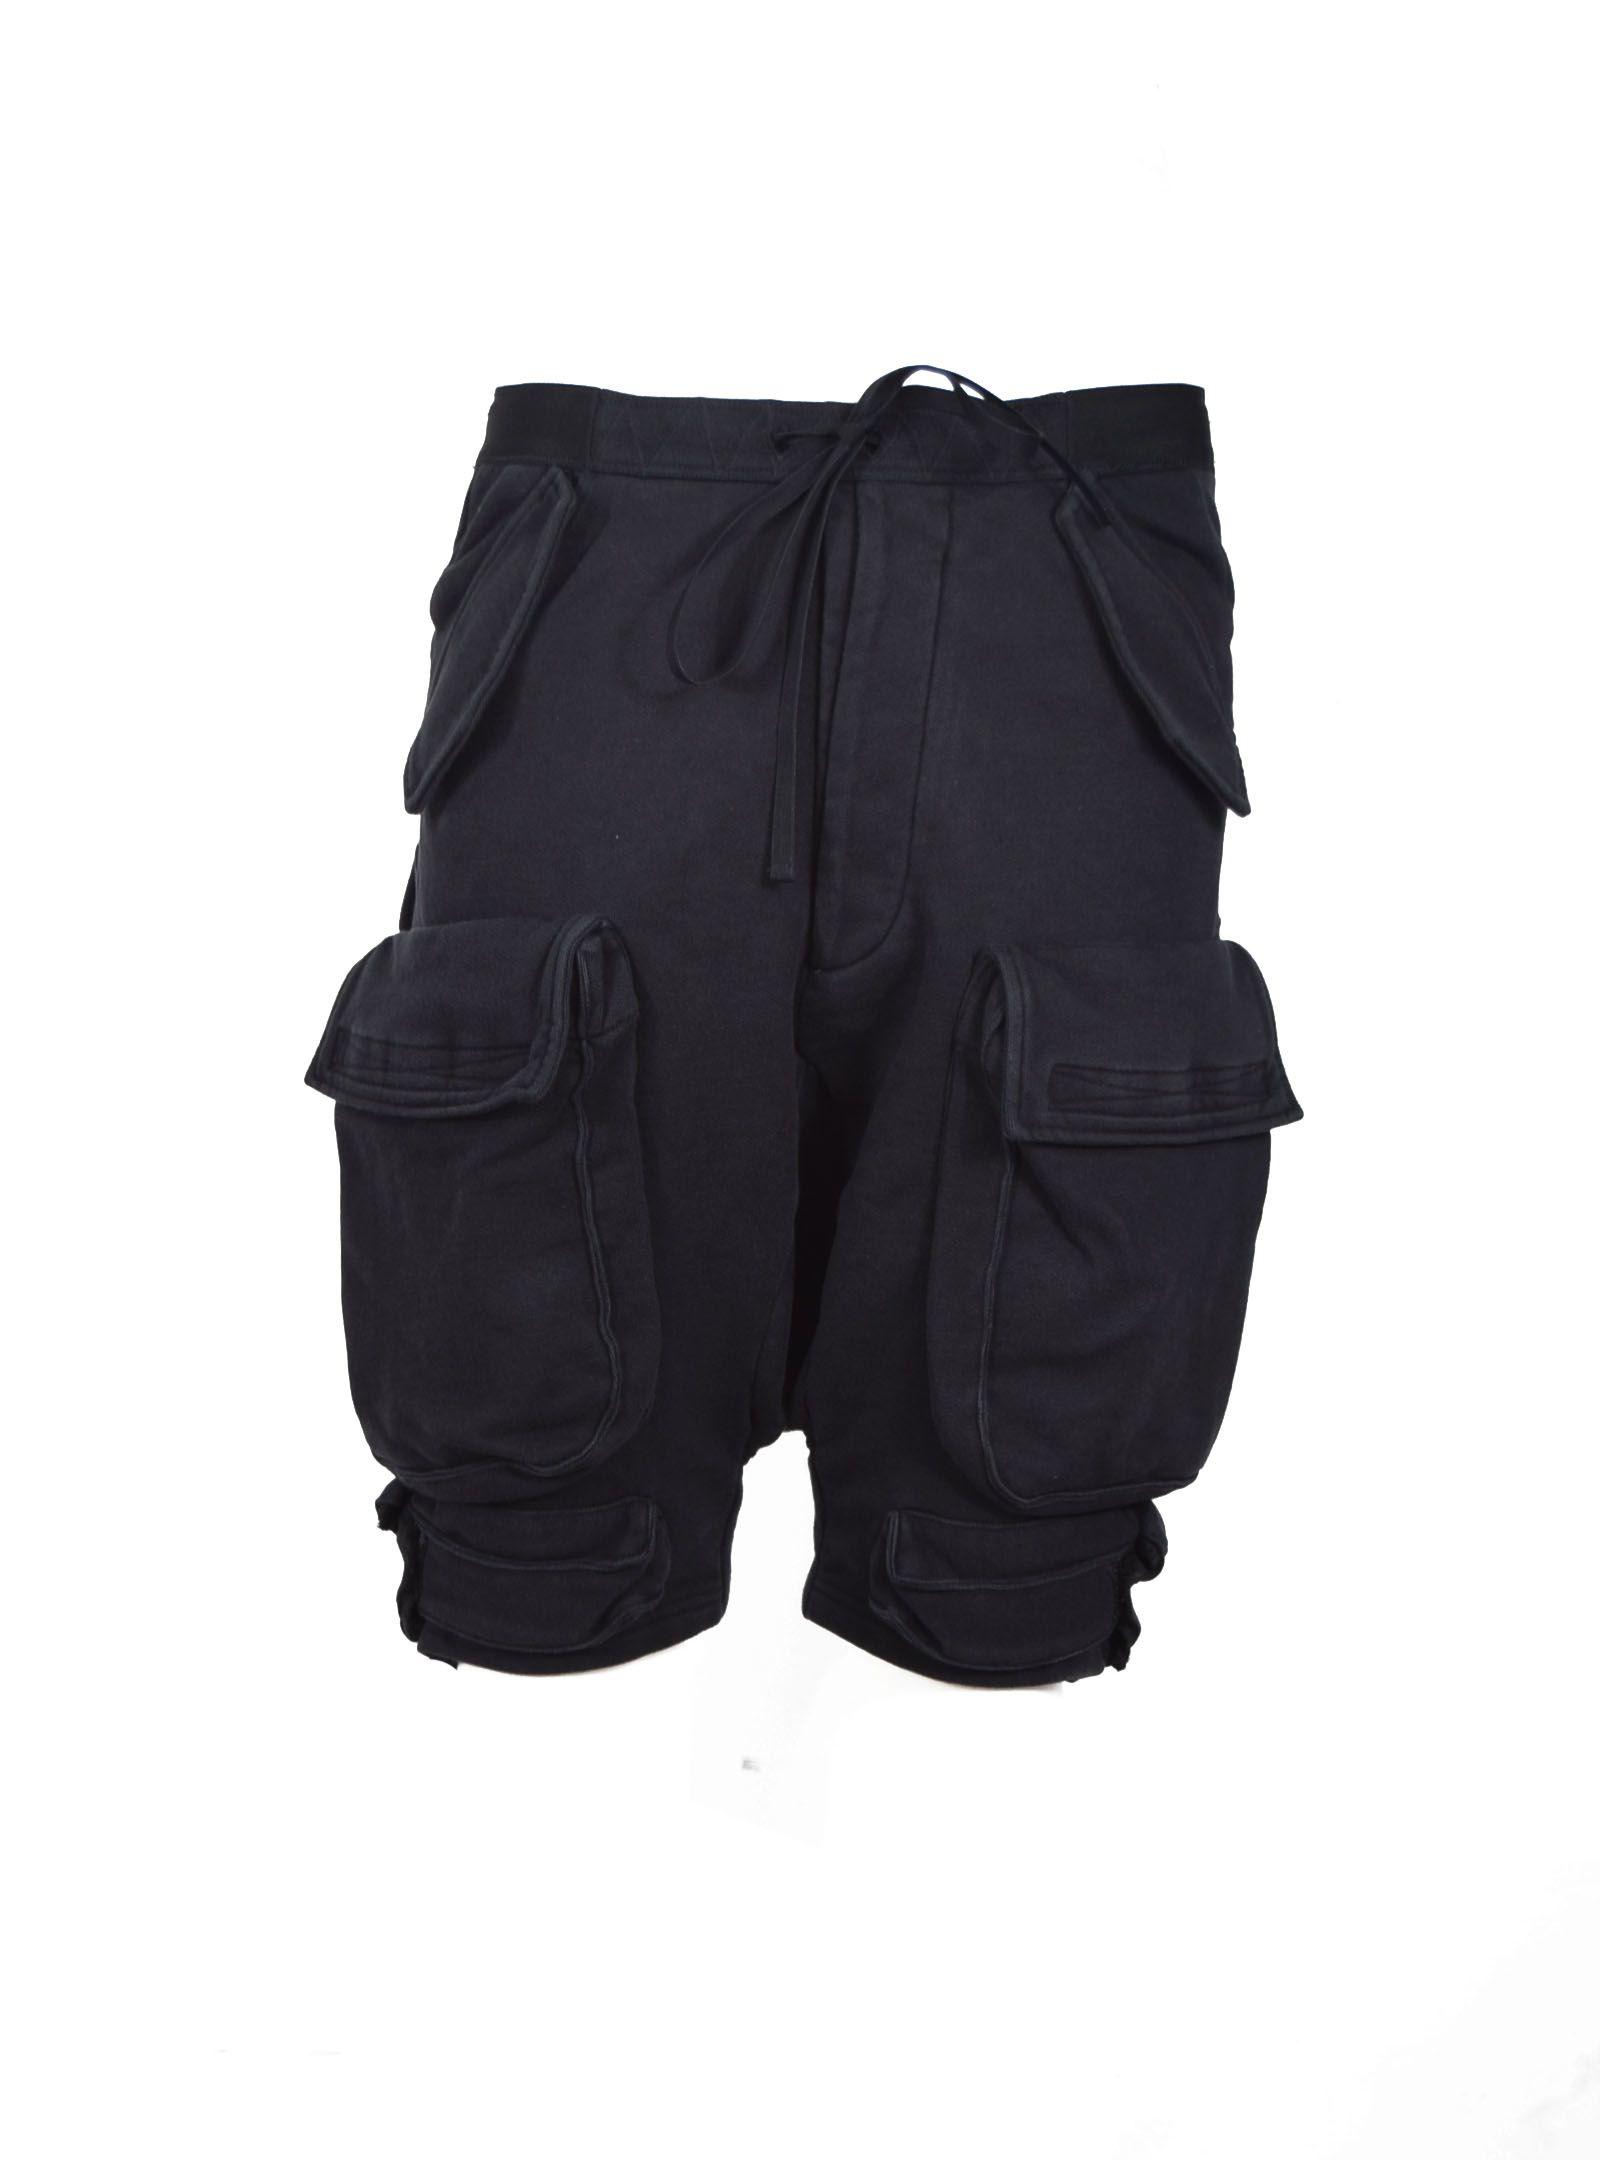 Ben Taverniti Unravel Project Cargo Pocket Track Shorts